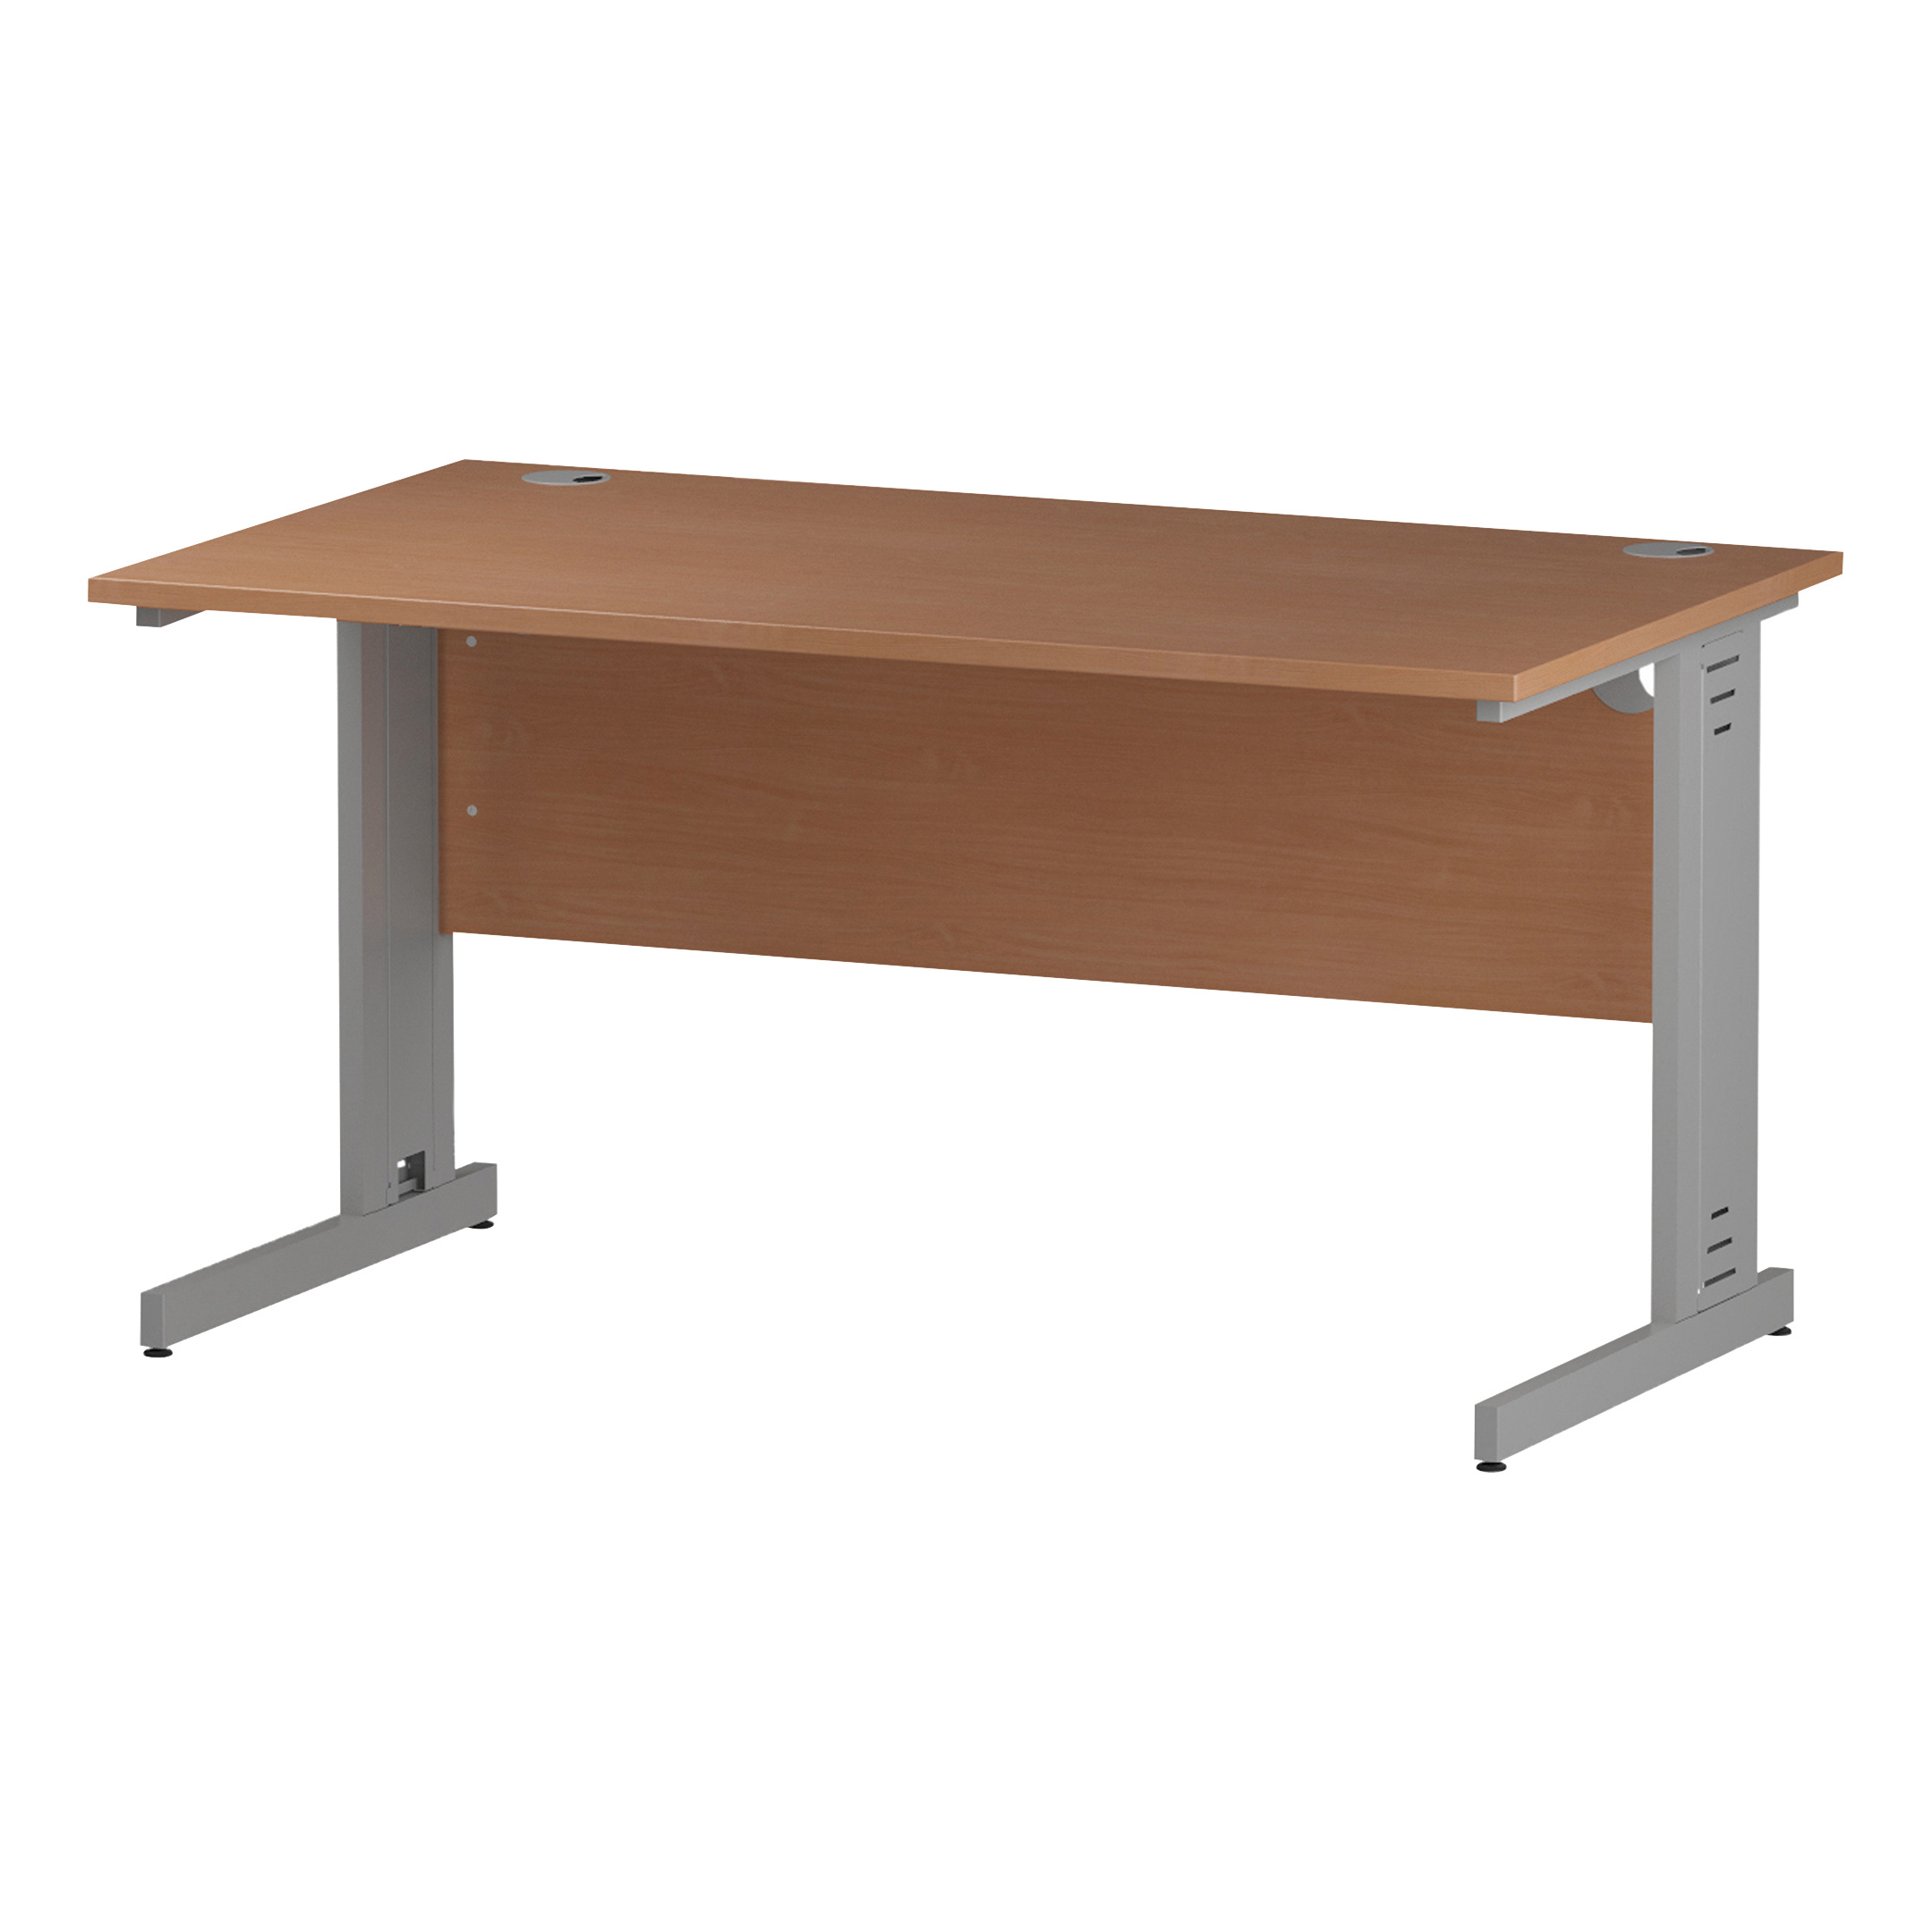 Trexus Rectangular Desk Silver Cable Managed Leg 1400x800mm Beech Ref I000460